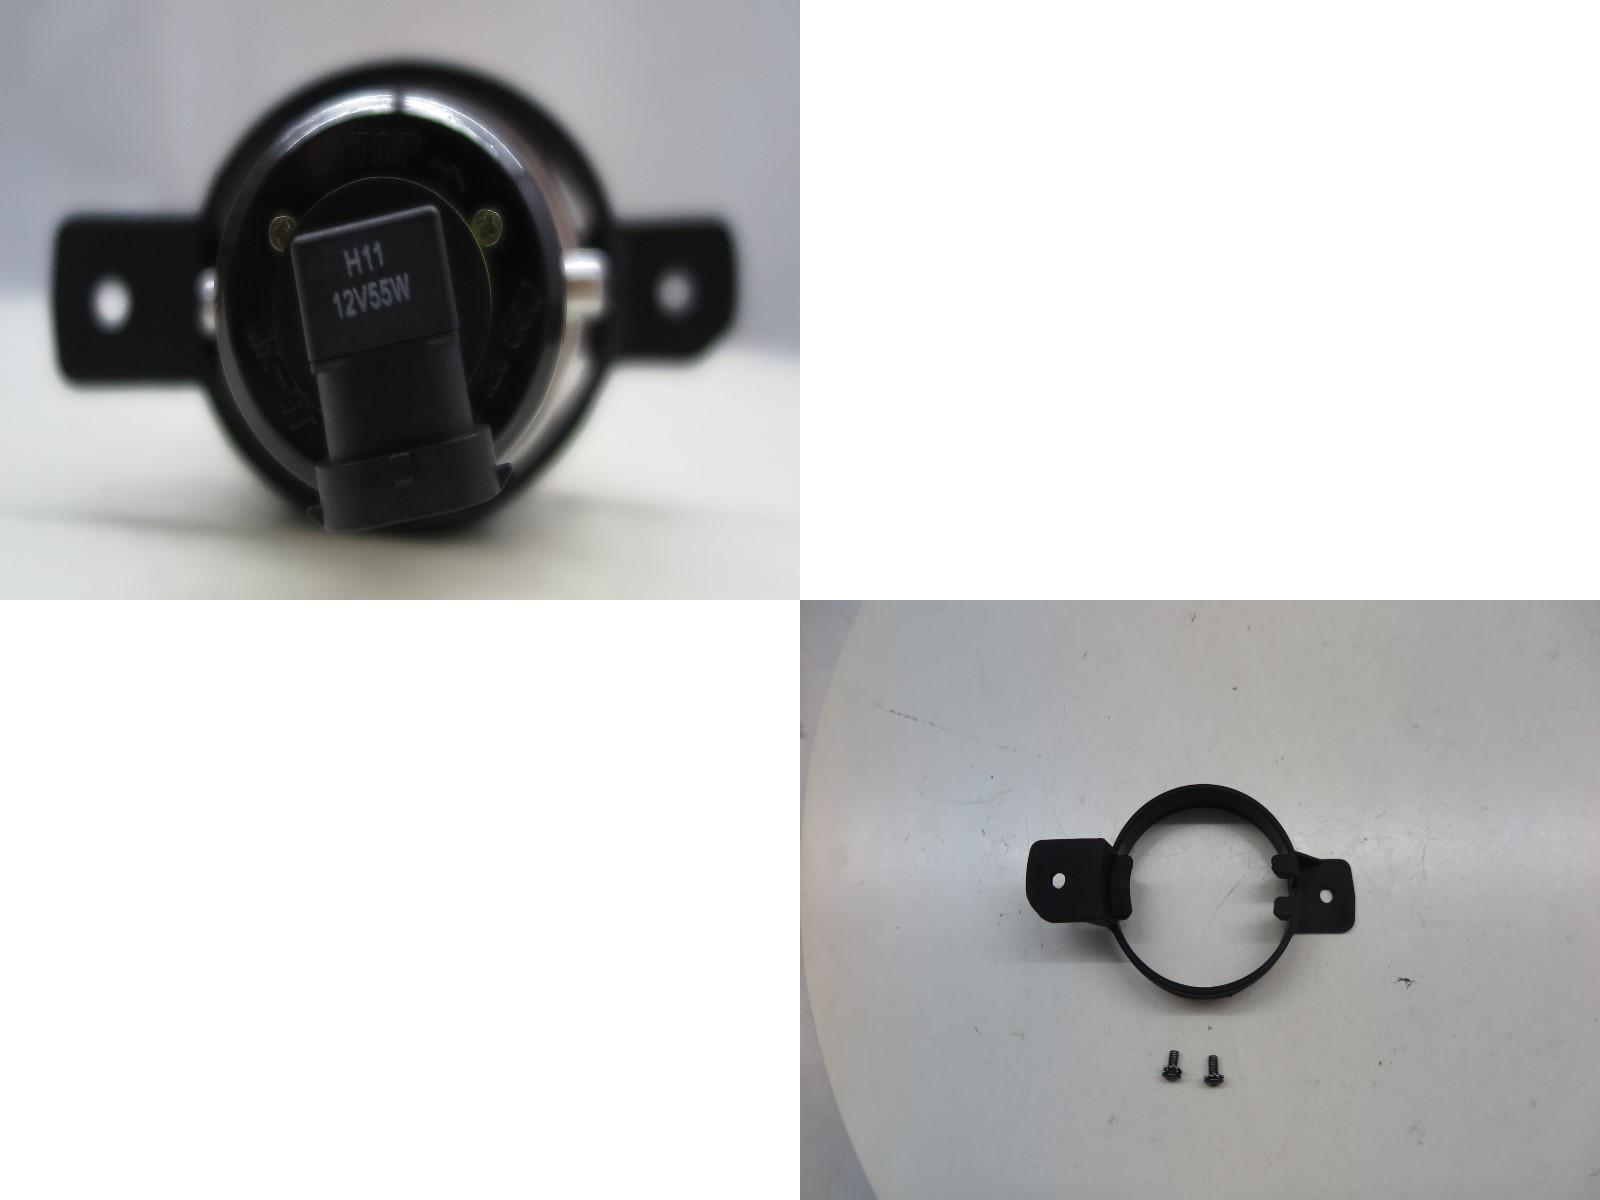 thumbnail 4 - Almera N16 MK2 2002-2006 Facelift 3D/4D/5D Projector Fog Light Black for NISSAN